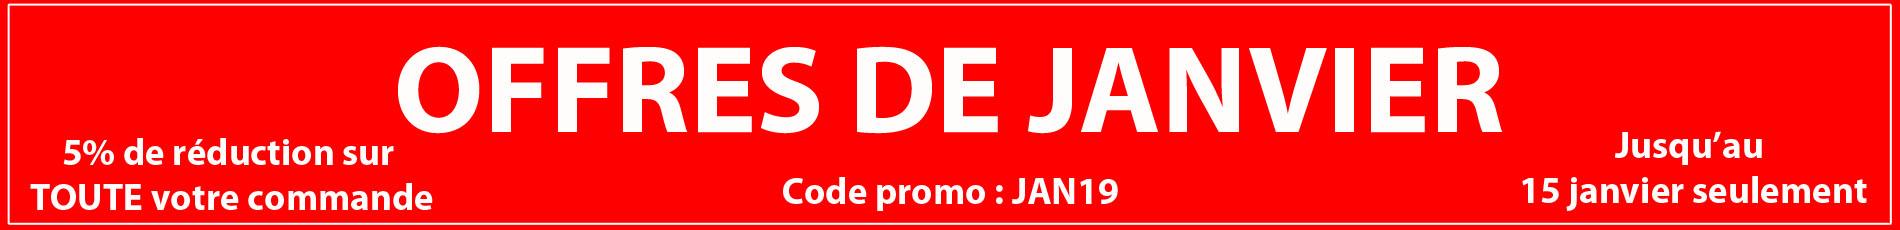 Promotions Offres Janvier Sauna Hammam